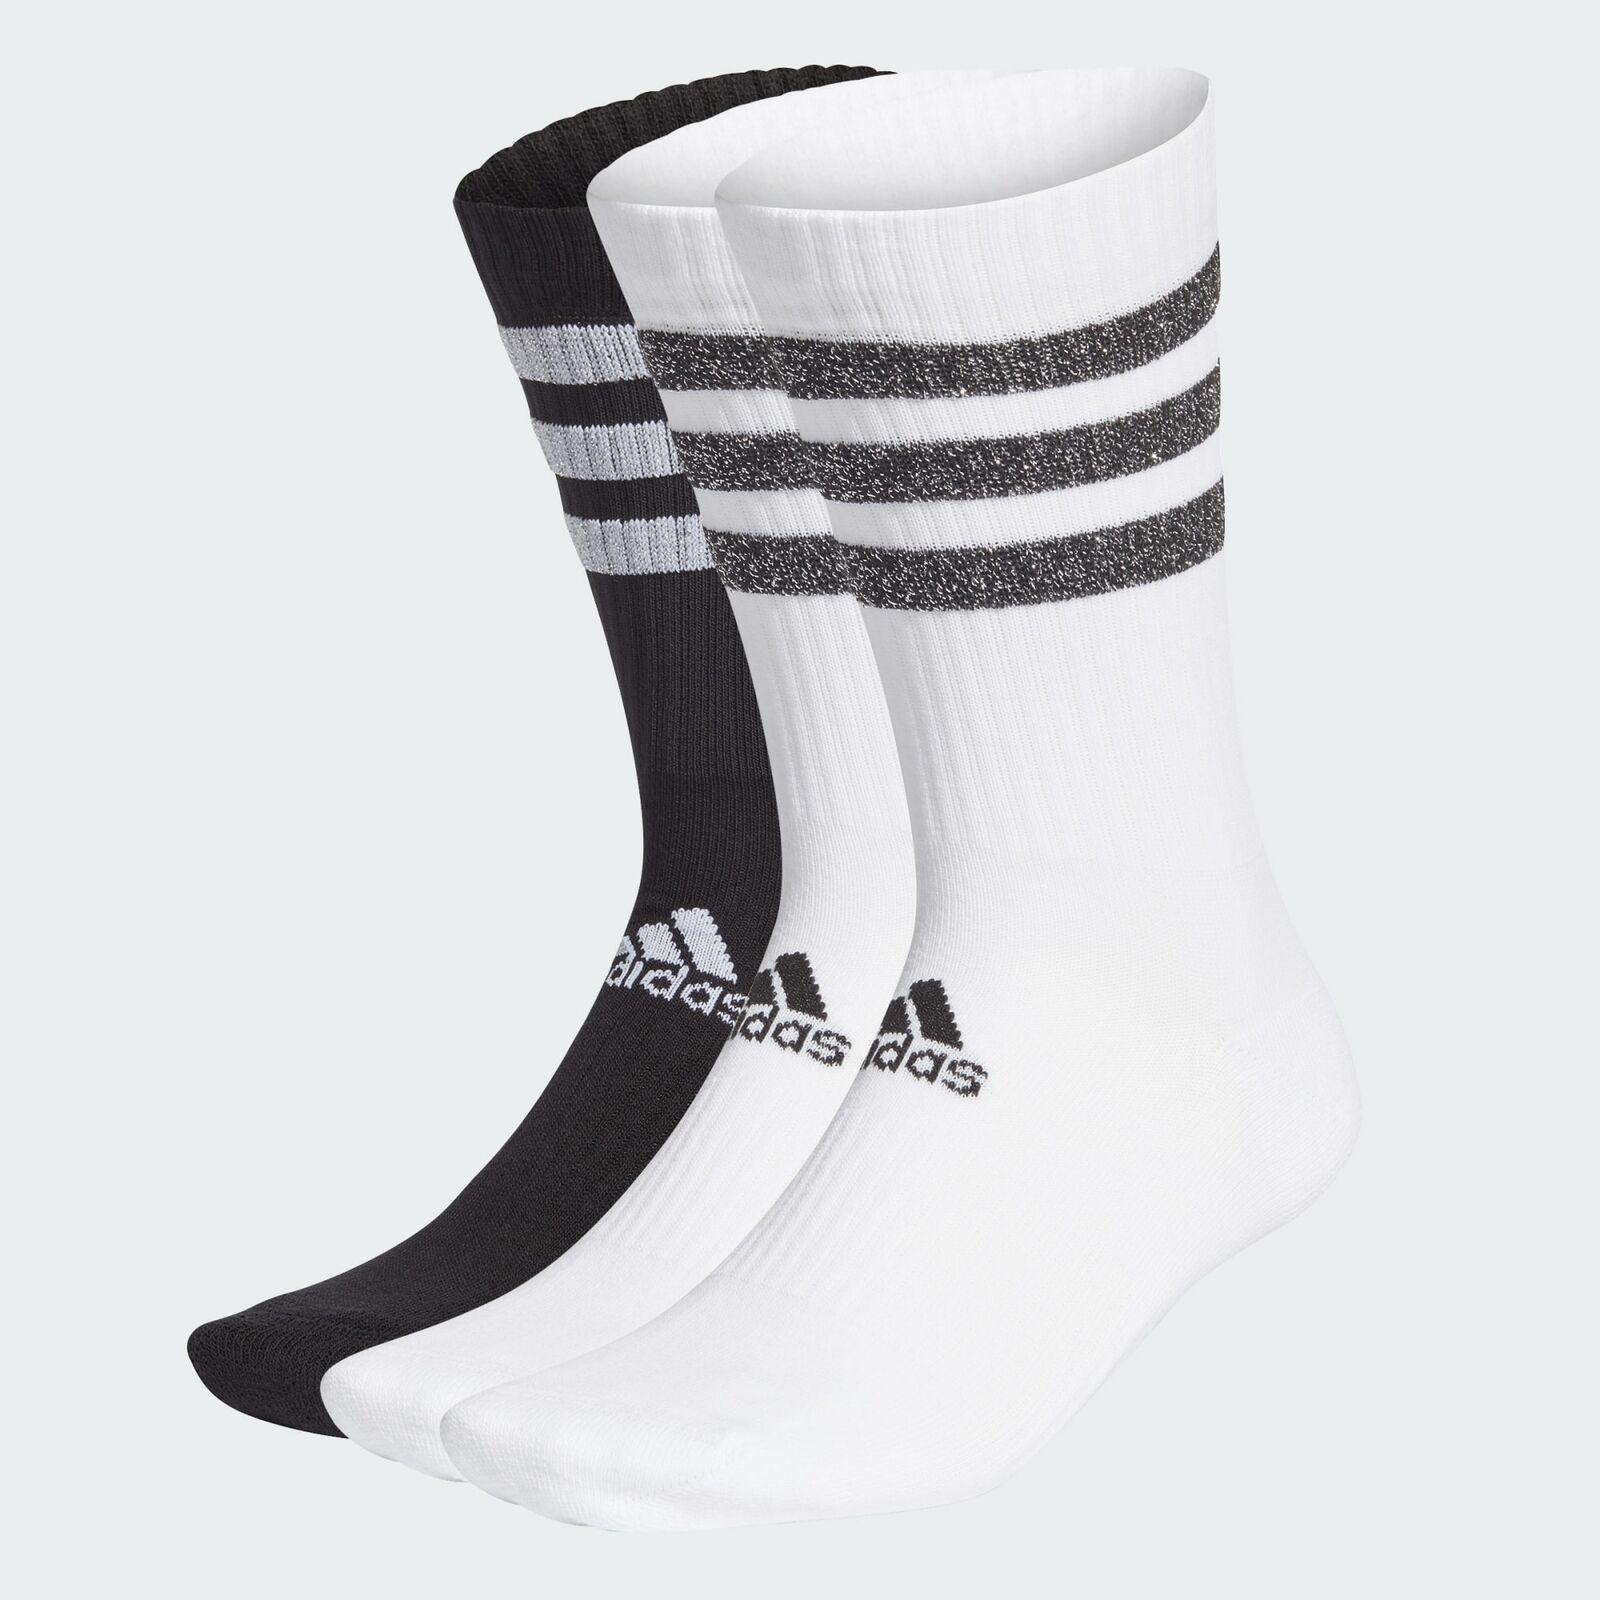 ADIDAS Socken / 3 Paar / 3S GLAM CRW WMS / Wadenlang